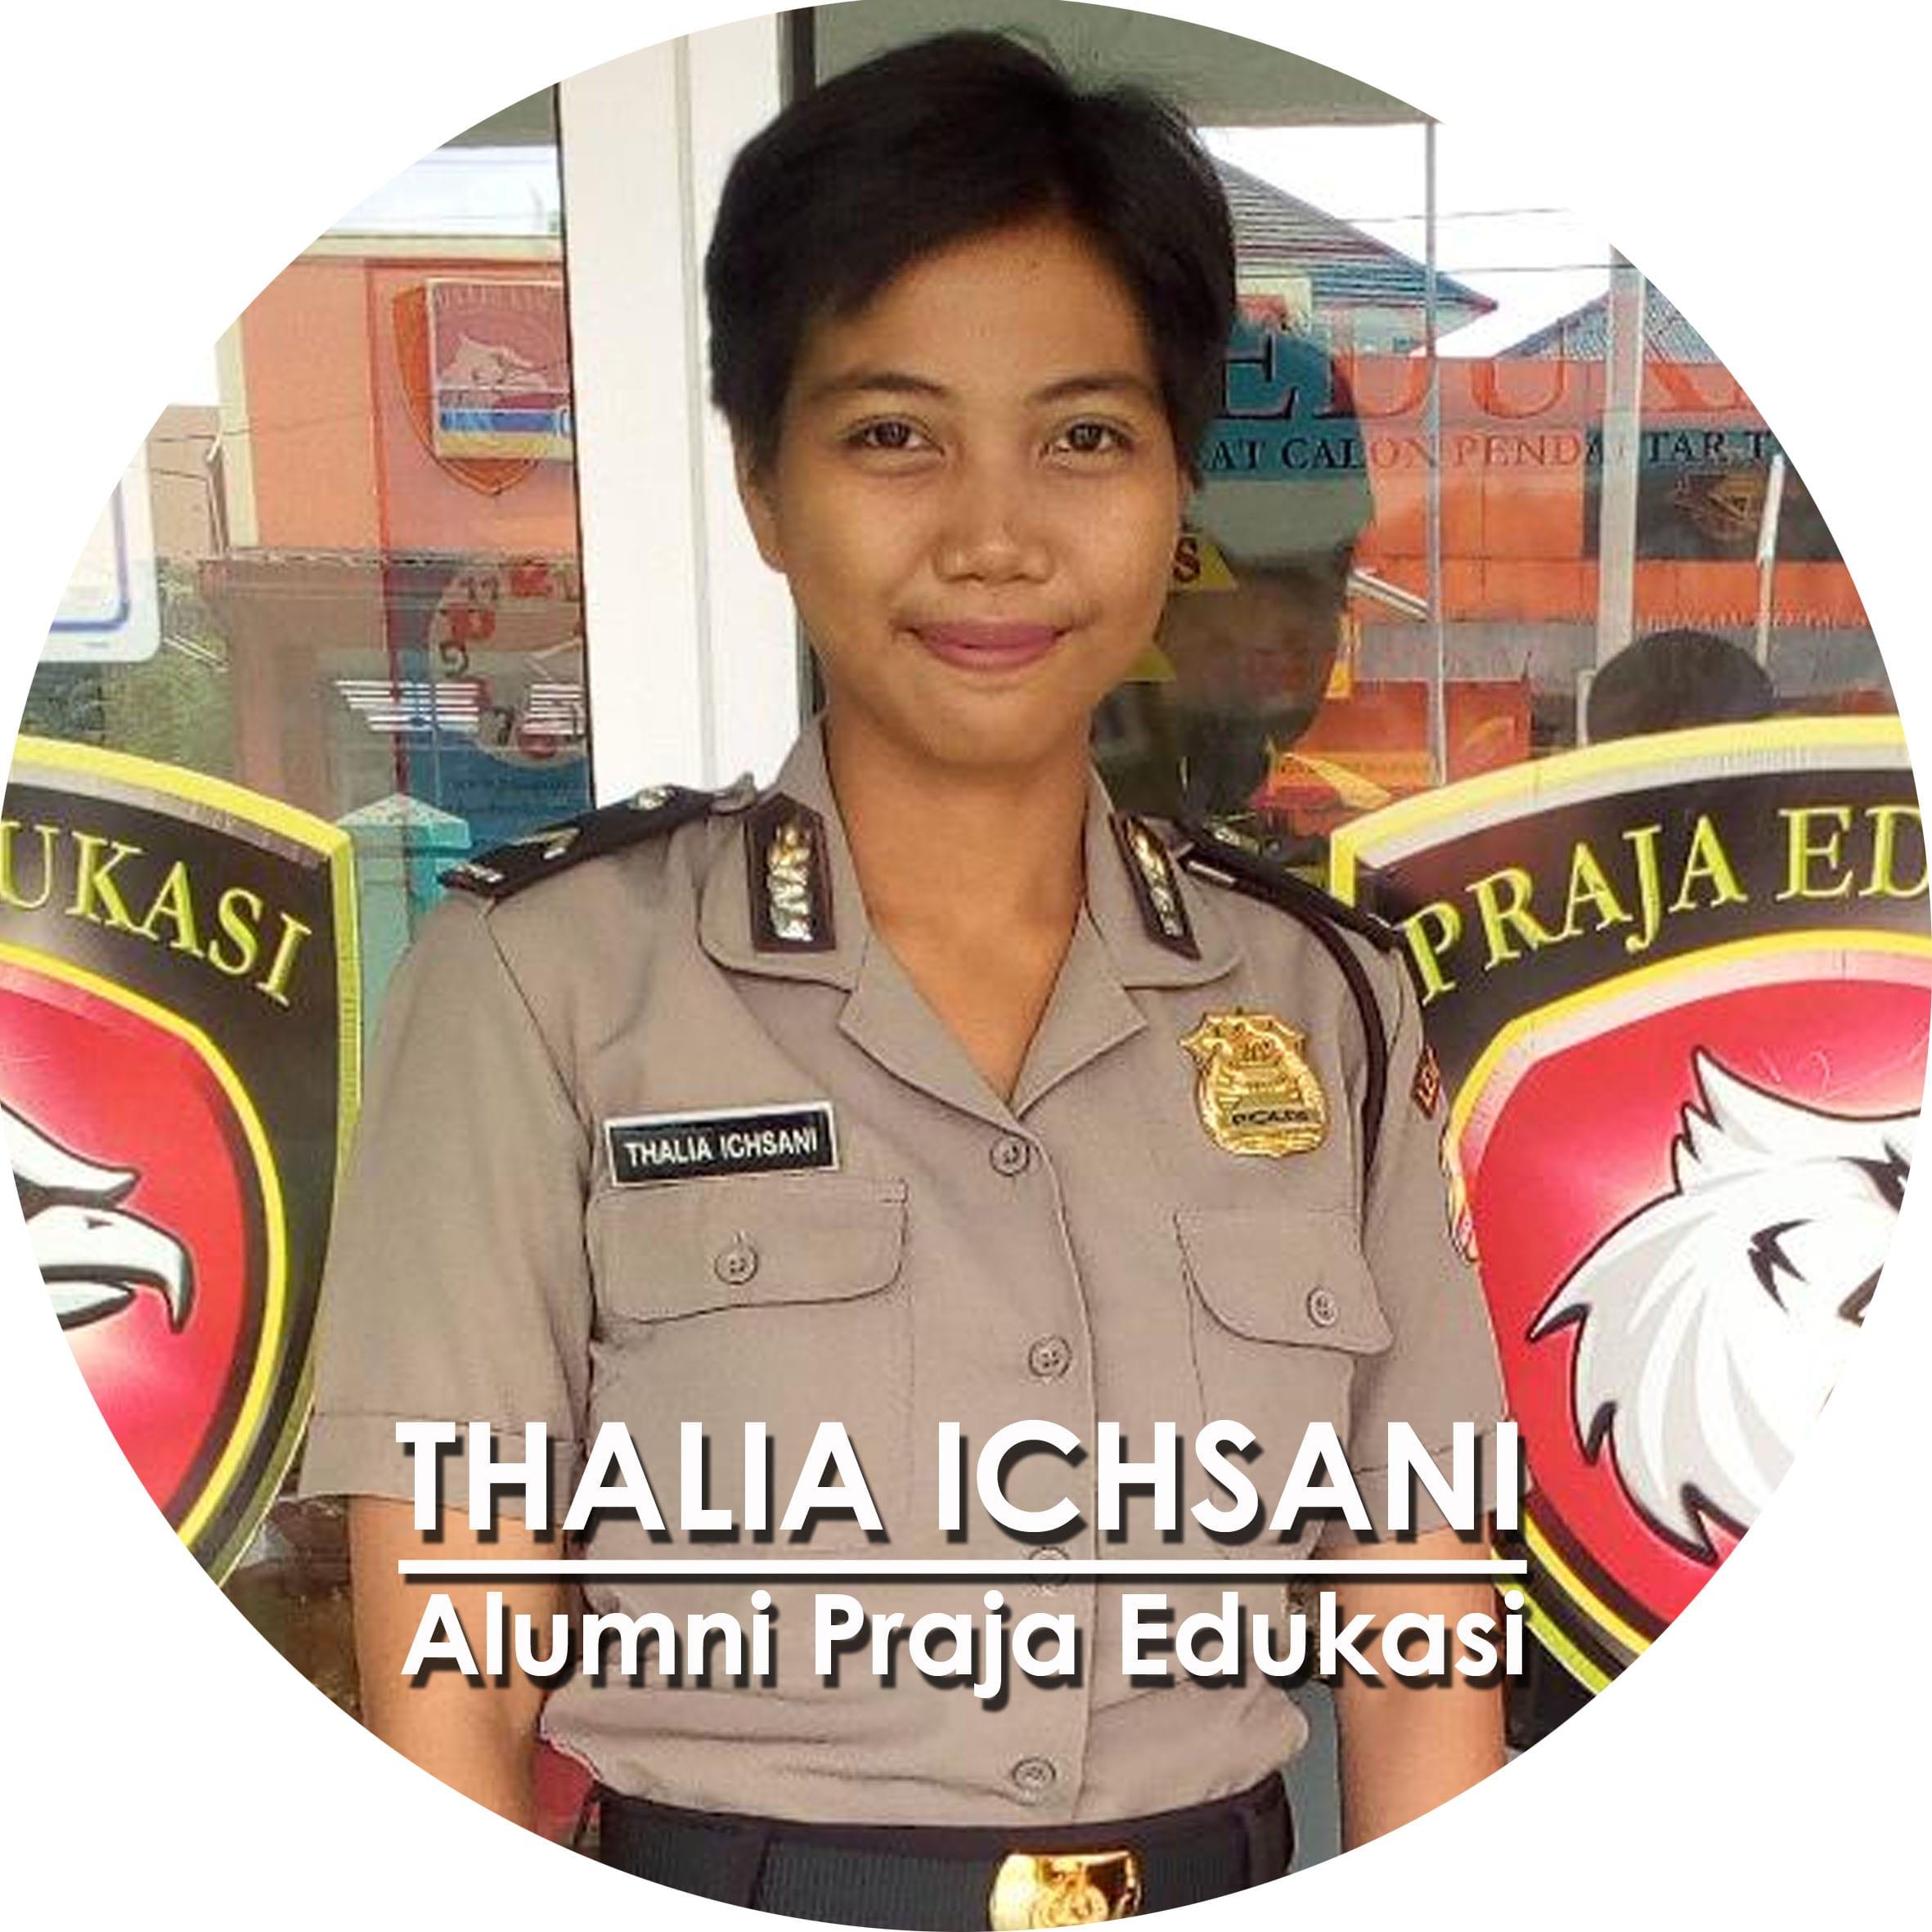 Thalia Ichsani